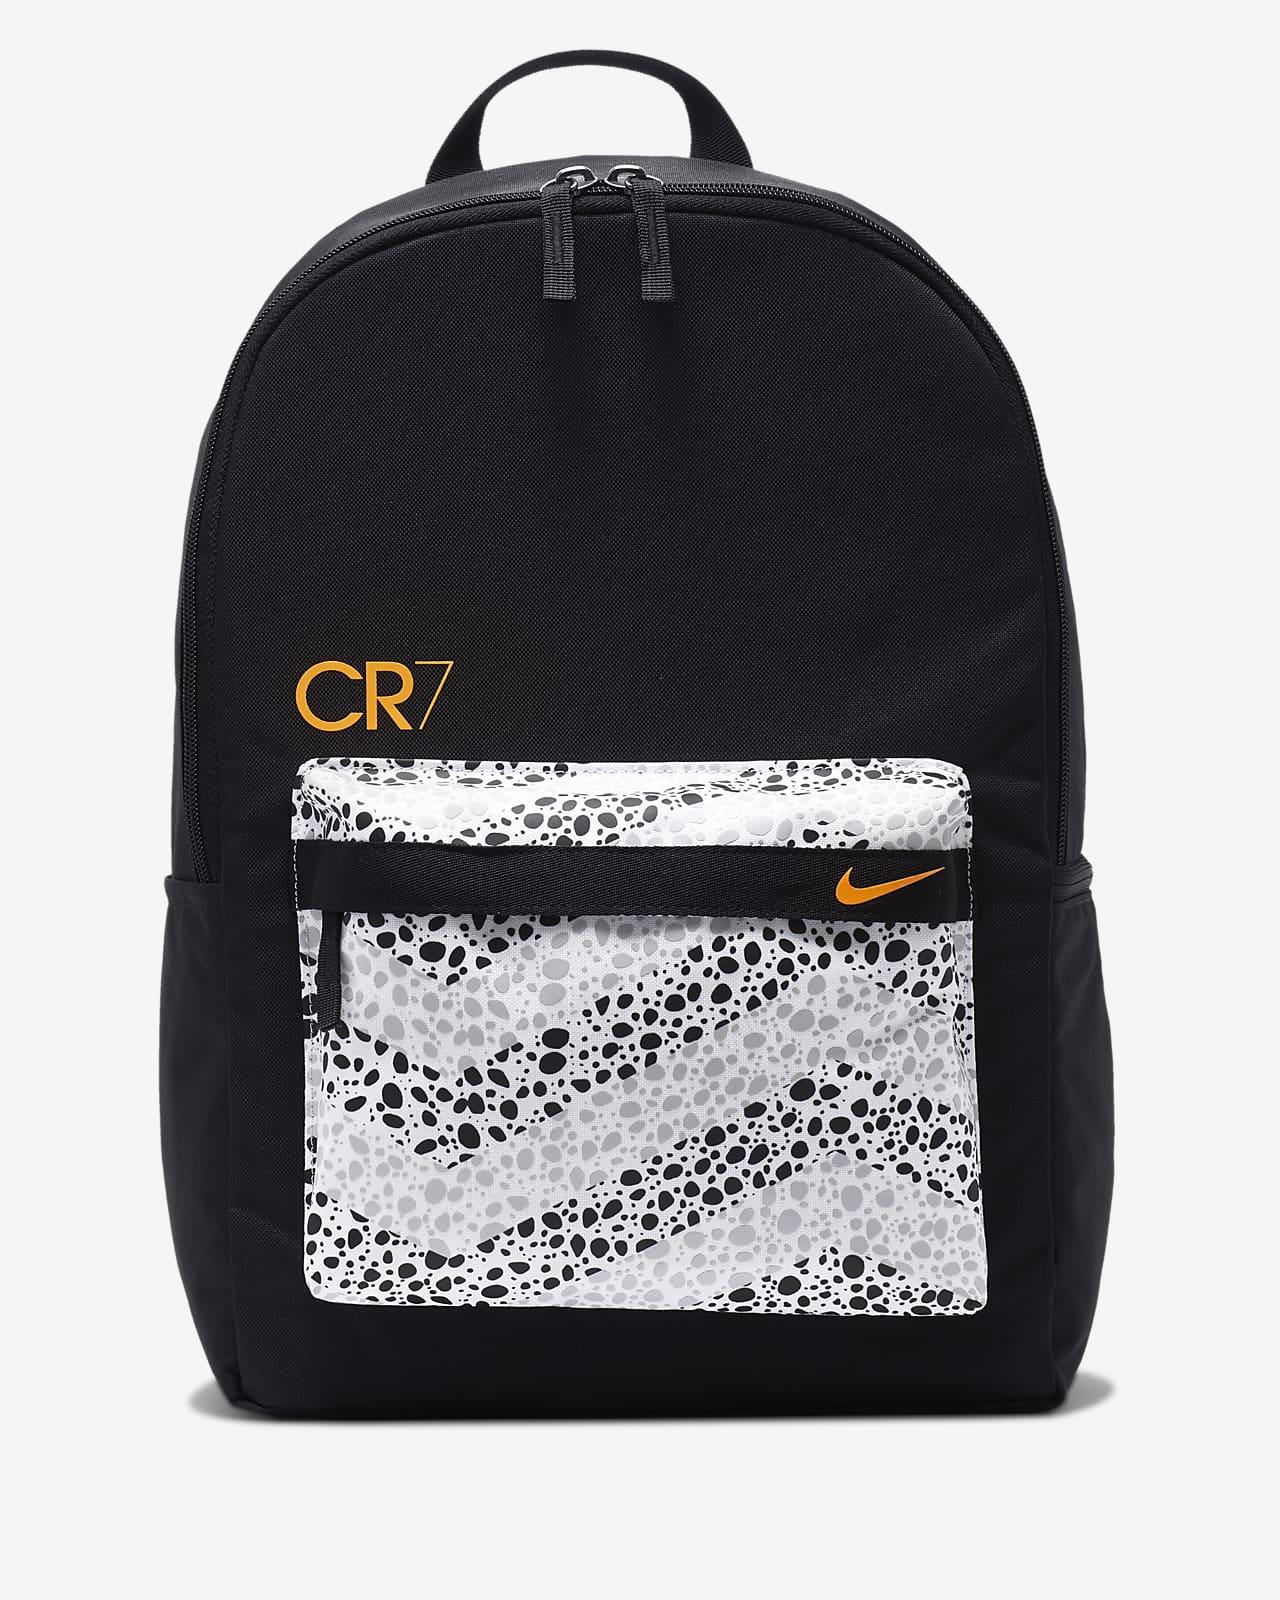 CR7 Kids' Football Backpack